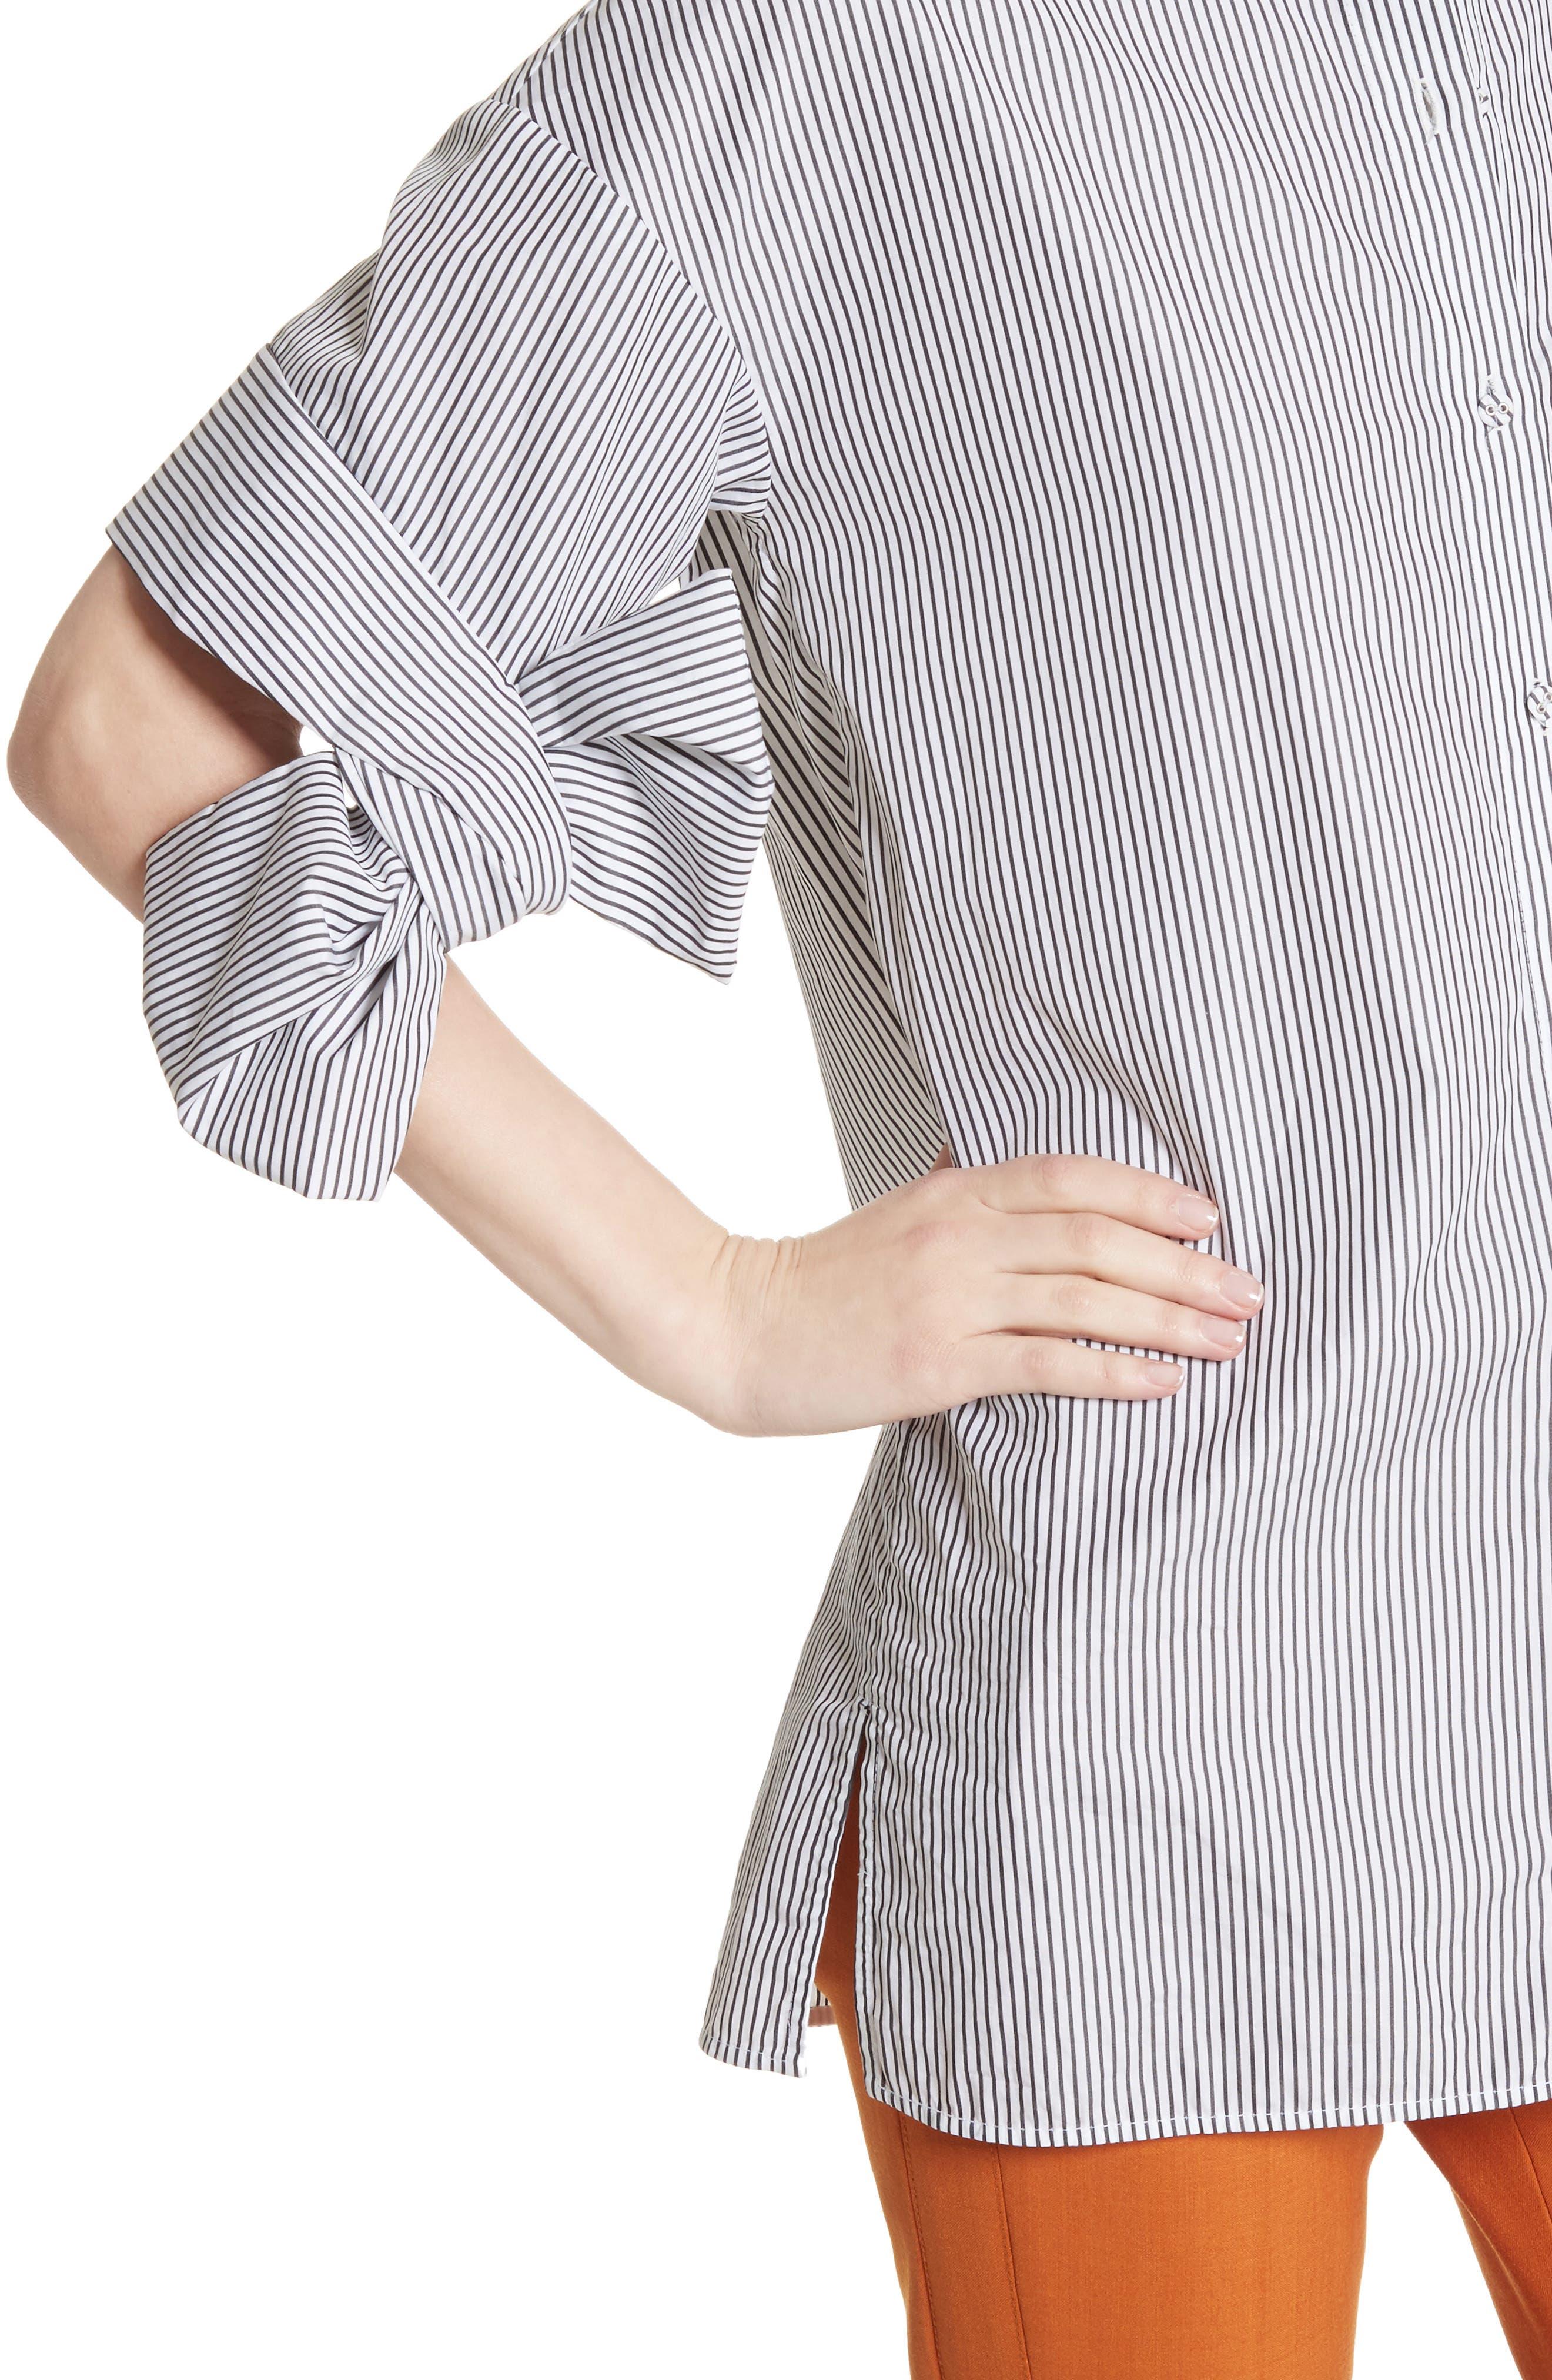 Bow Sleeve Shirt,                             Alternate thumbnail 4, color,                             Black/ White